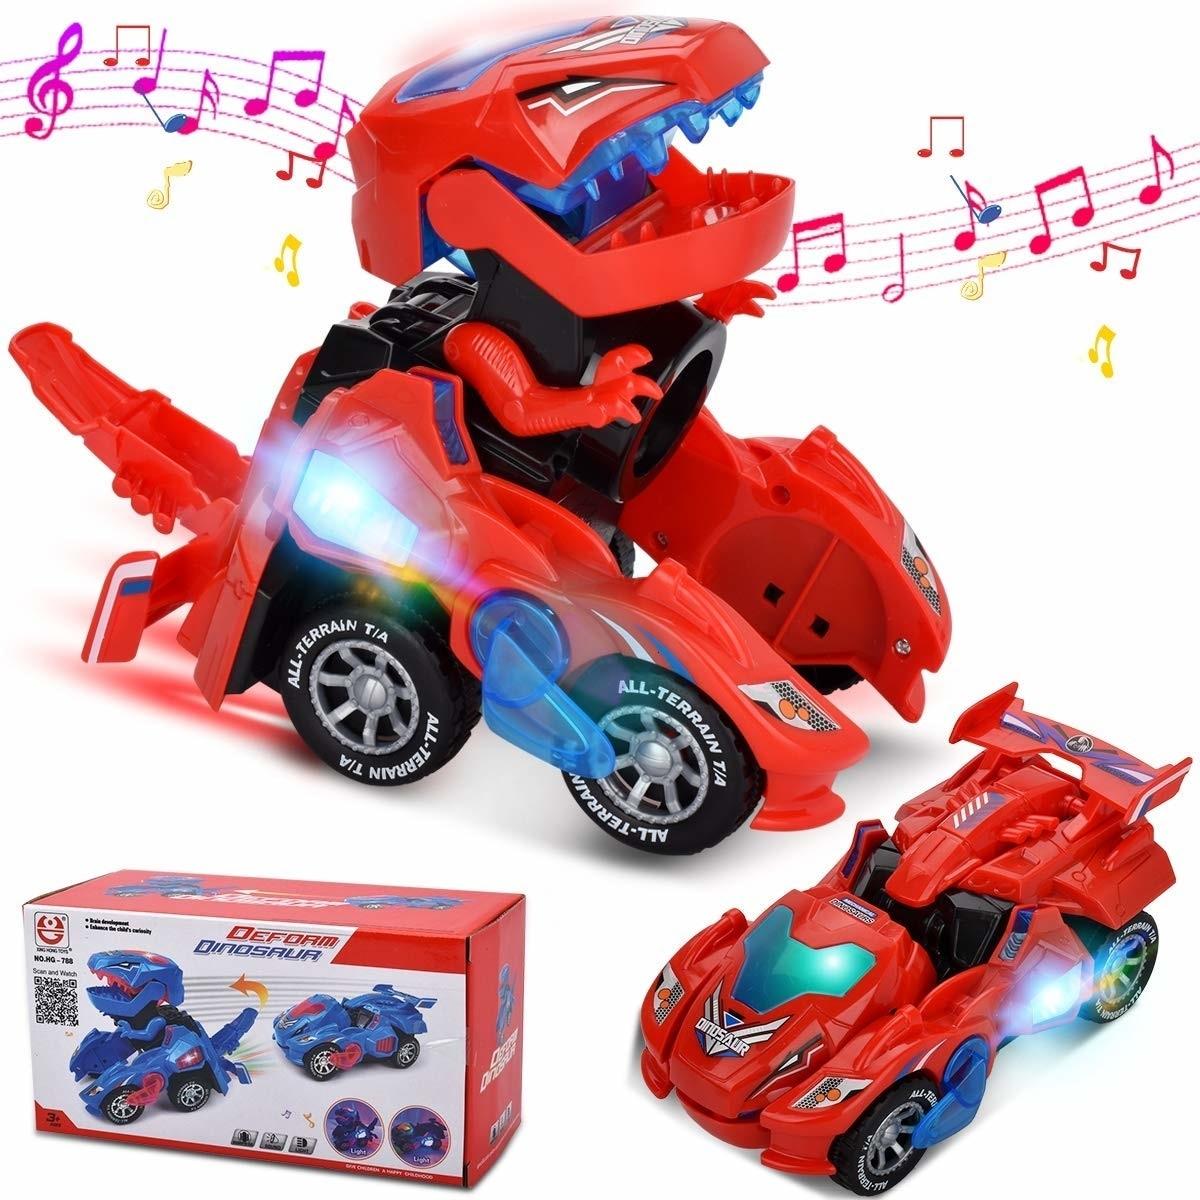 Transforming Dinosaur LED CarT-Rex Toys With Light SoundElectric toyHOT